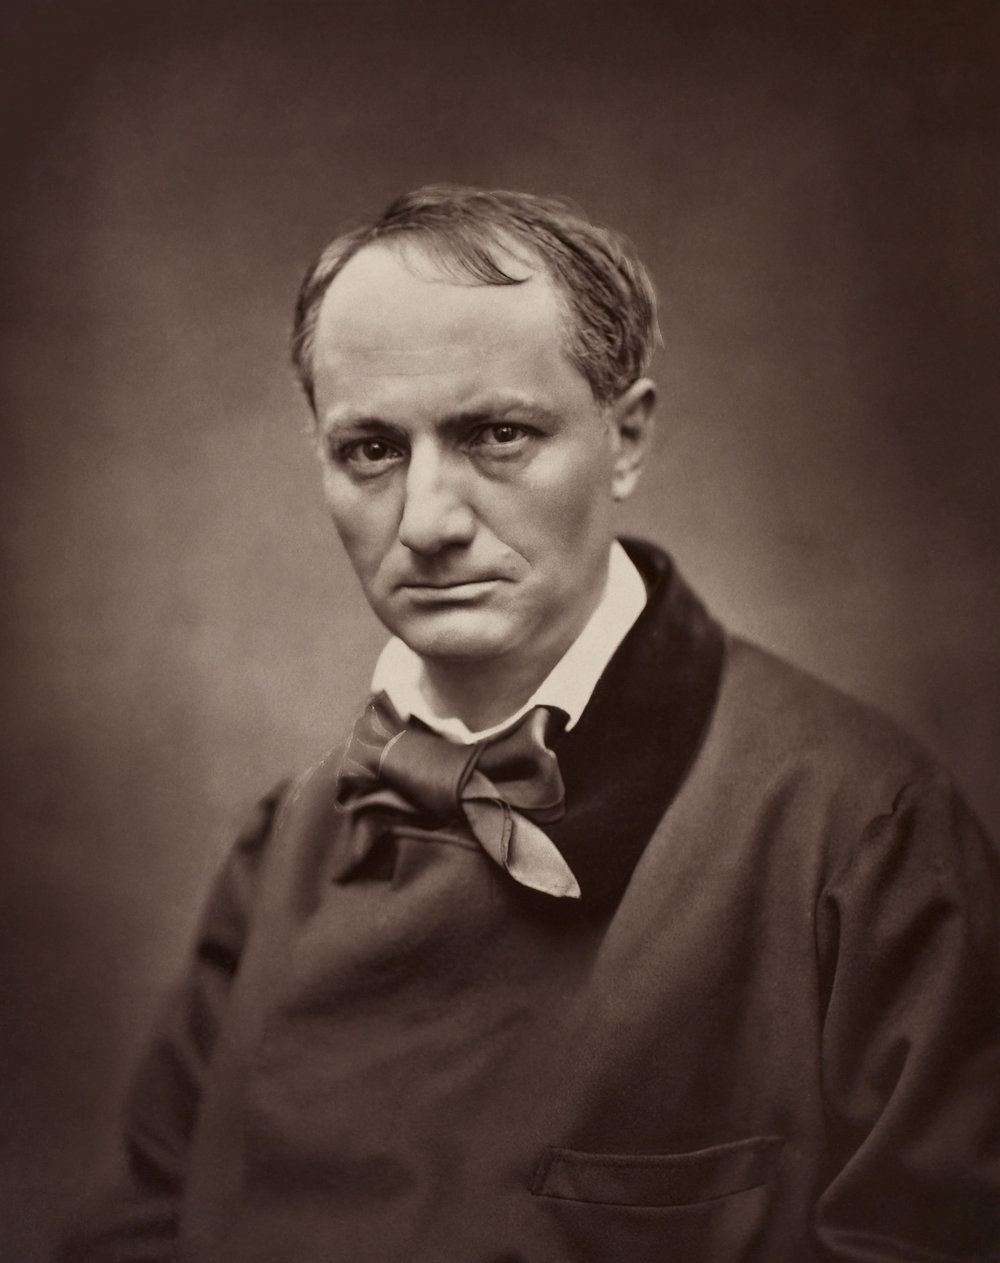 101 Étienne_Carjat,_Portrait_of_Charles_Baudelaire,_circa_1862.jpg